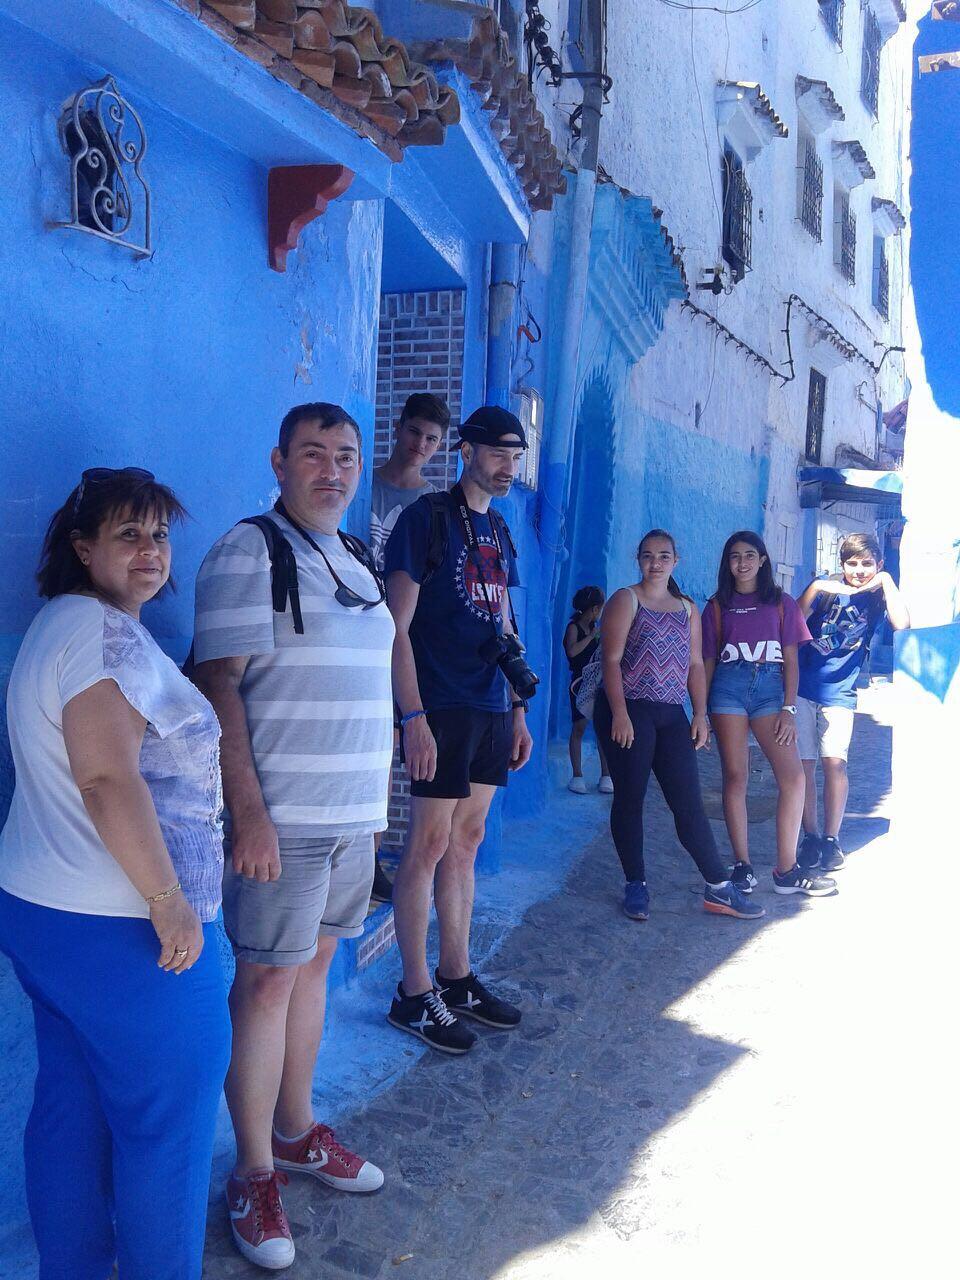 viajes-amazigh-marruecos-familiias-18222